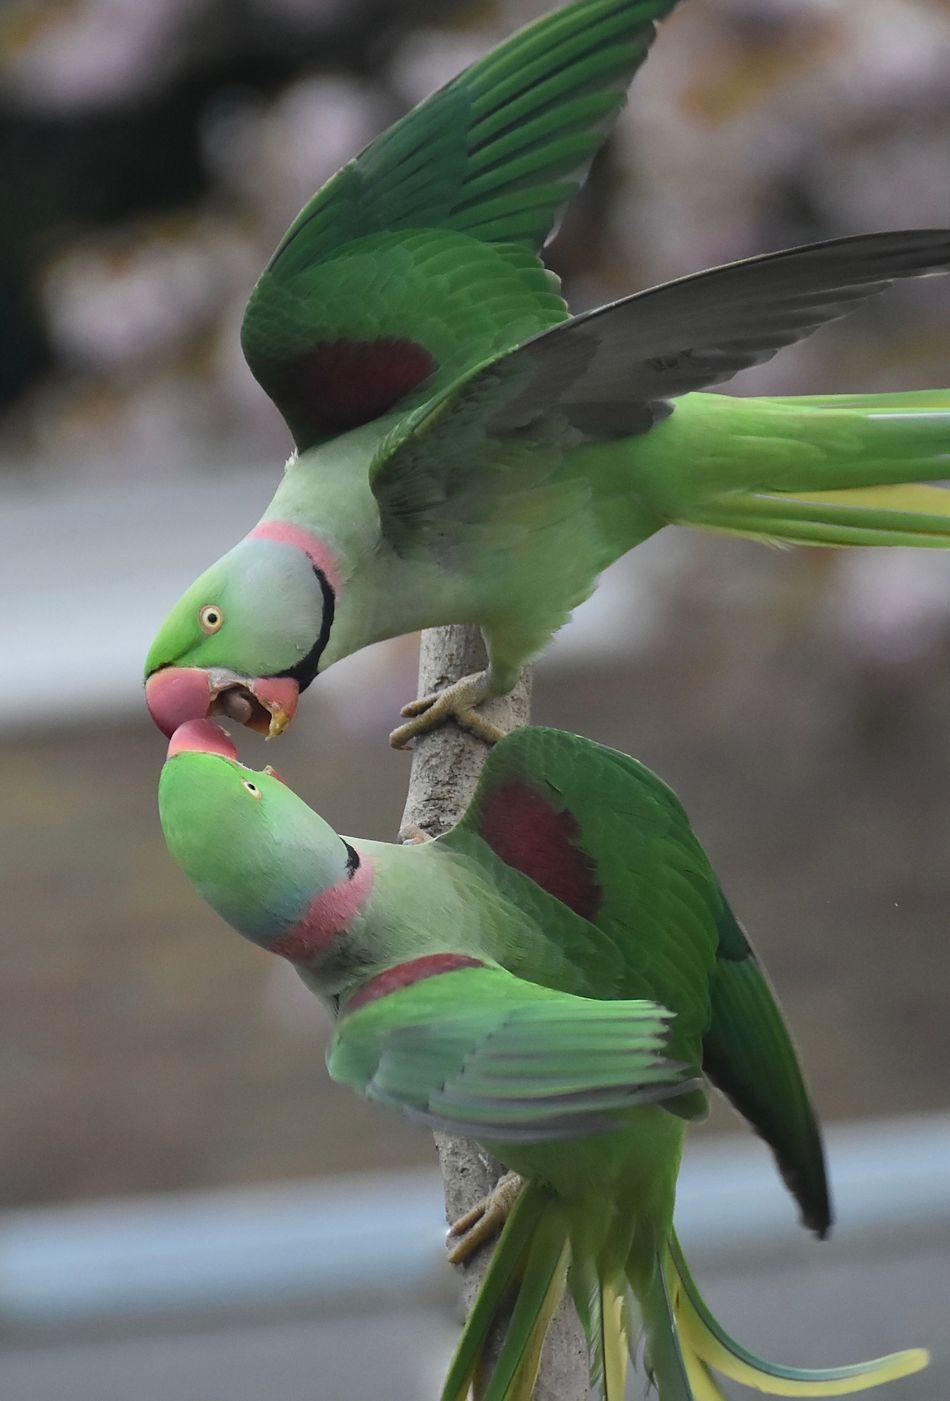 Bird Photography Alexandrian Parakeet Fighting Birds_collection Green Green Green!  Exotic Creatures Nature Photography Urban Nature